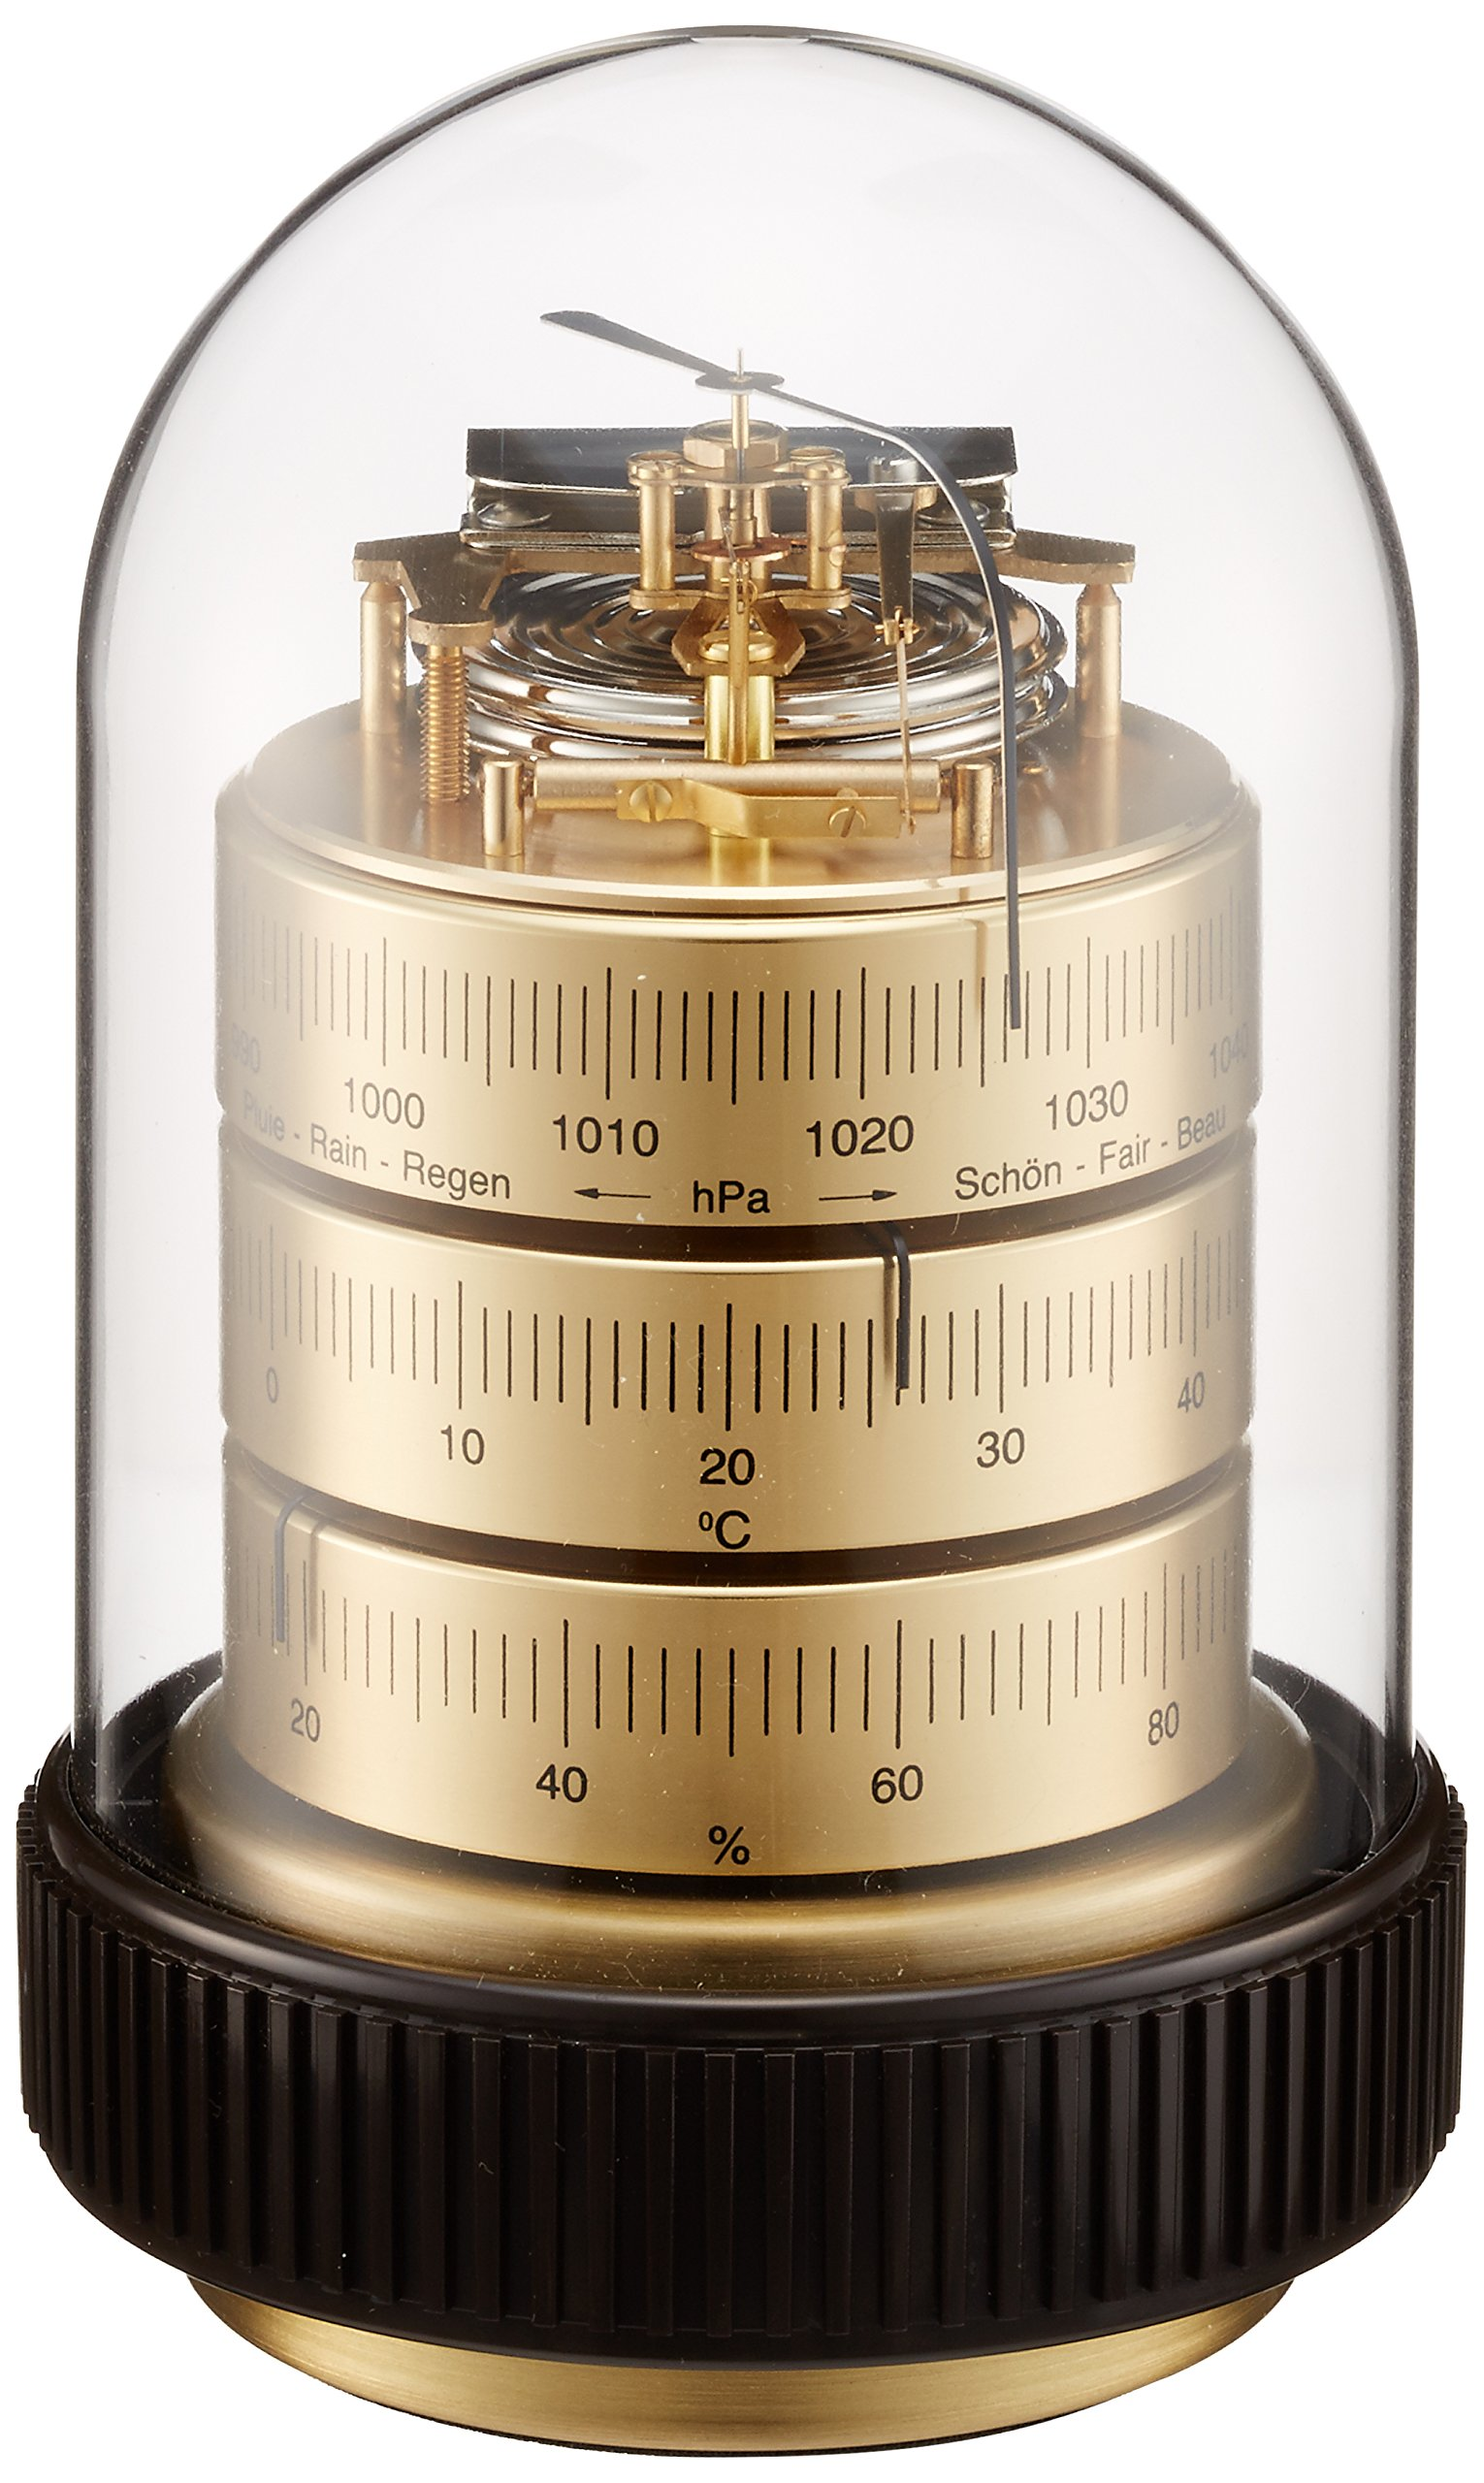 Barigo temperature and humidity barometer Gold